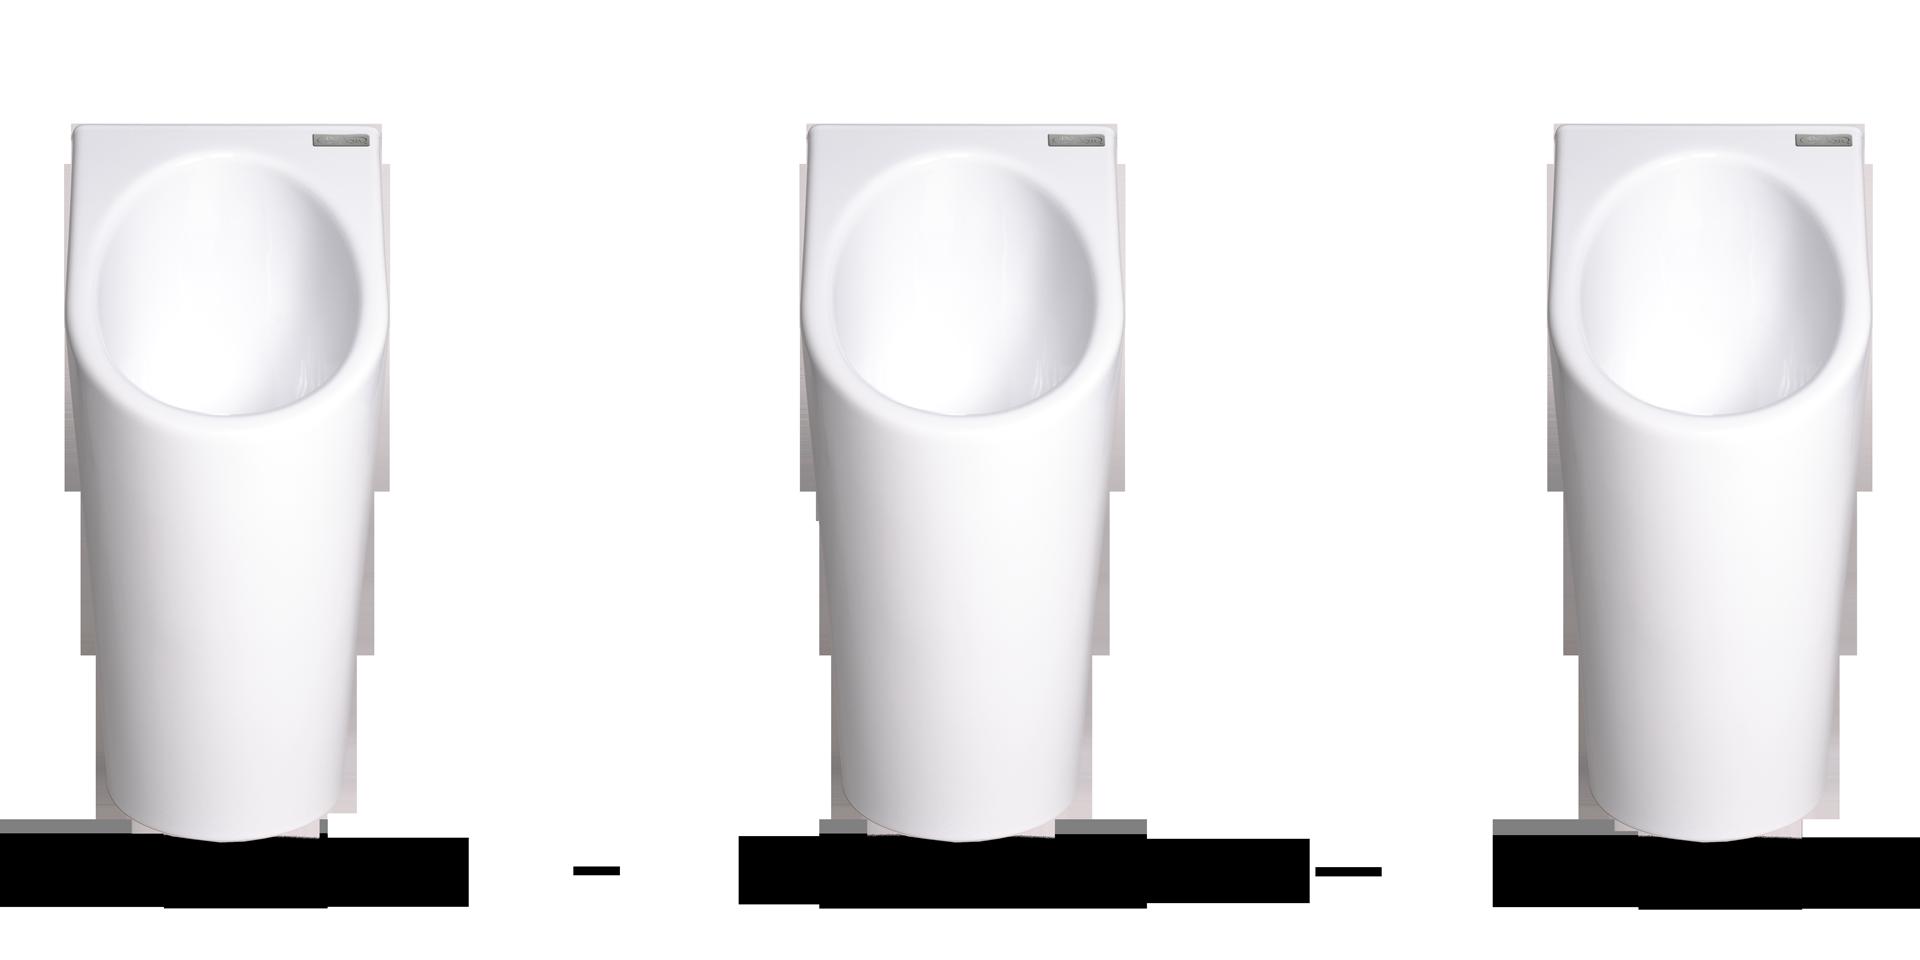 senza aqua ceramic urinal pissoir die innovation einzigartiges system. Black Bedroom Furniture Sets. Home Design Ideas